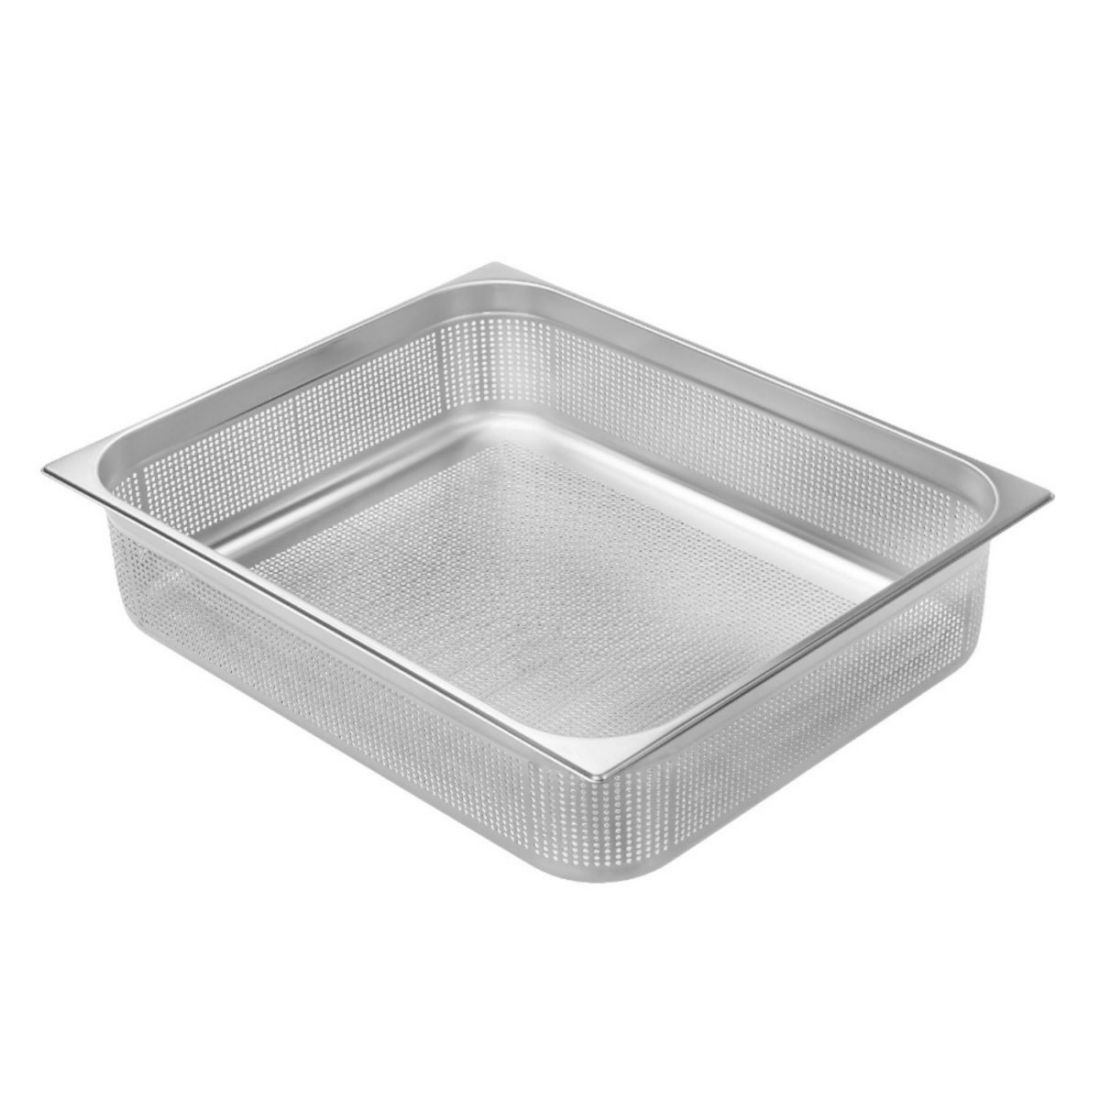 Gastronádoba Profi děrovaná GN 2/1 020 mm